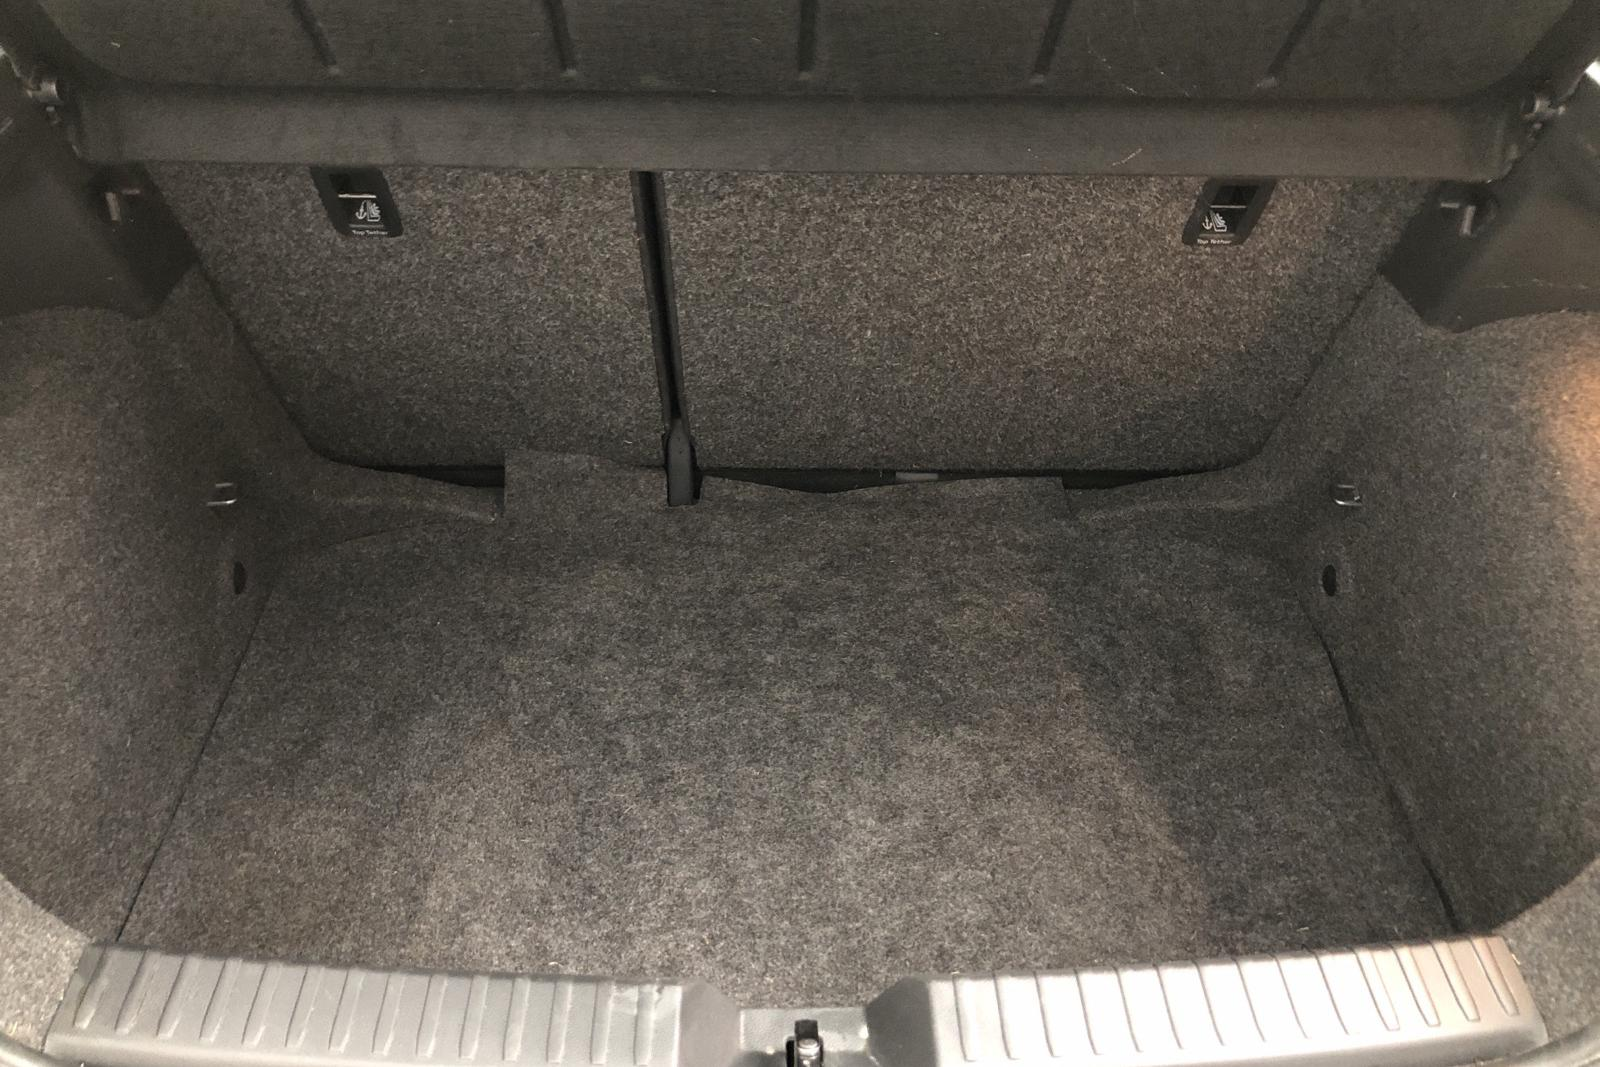 Seat Ibiza 1.0 TSI 5dr (95hk) - 4 528 mil - Manuell - grå - 2018